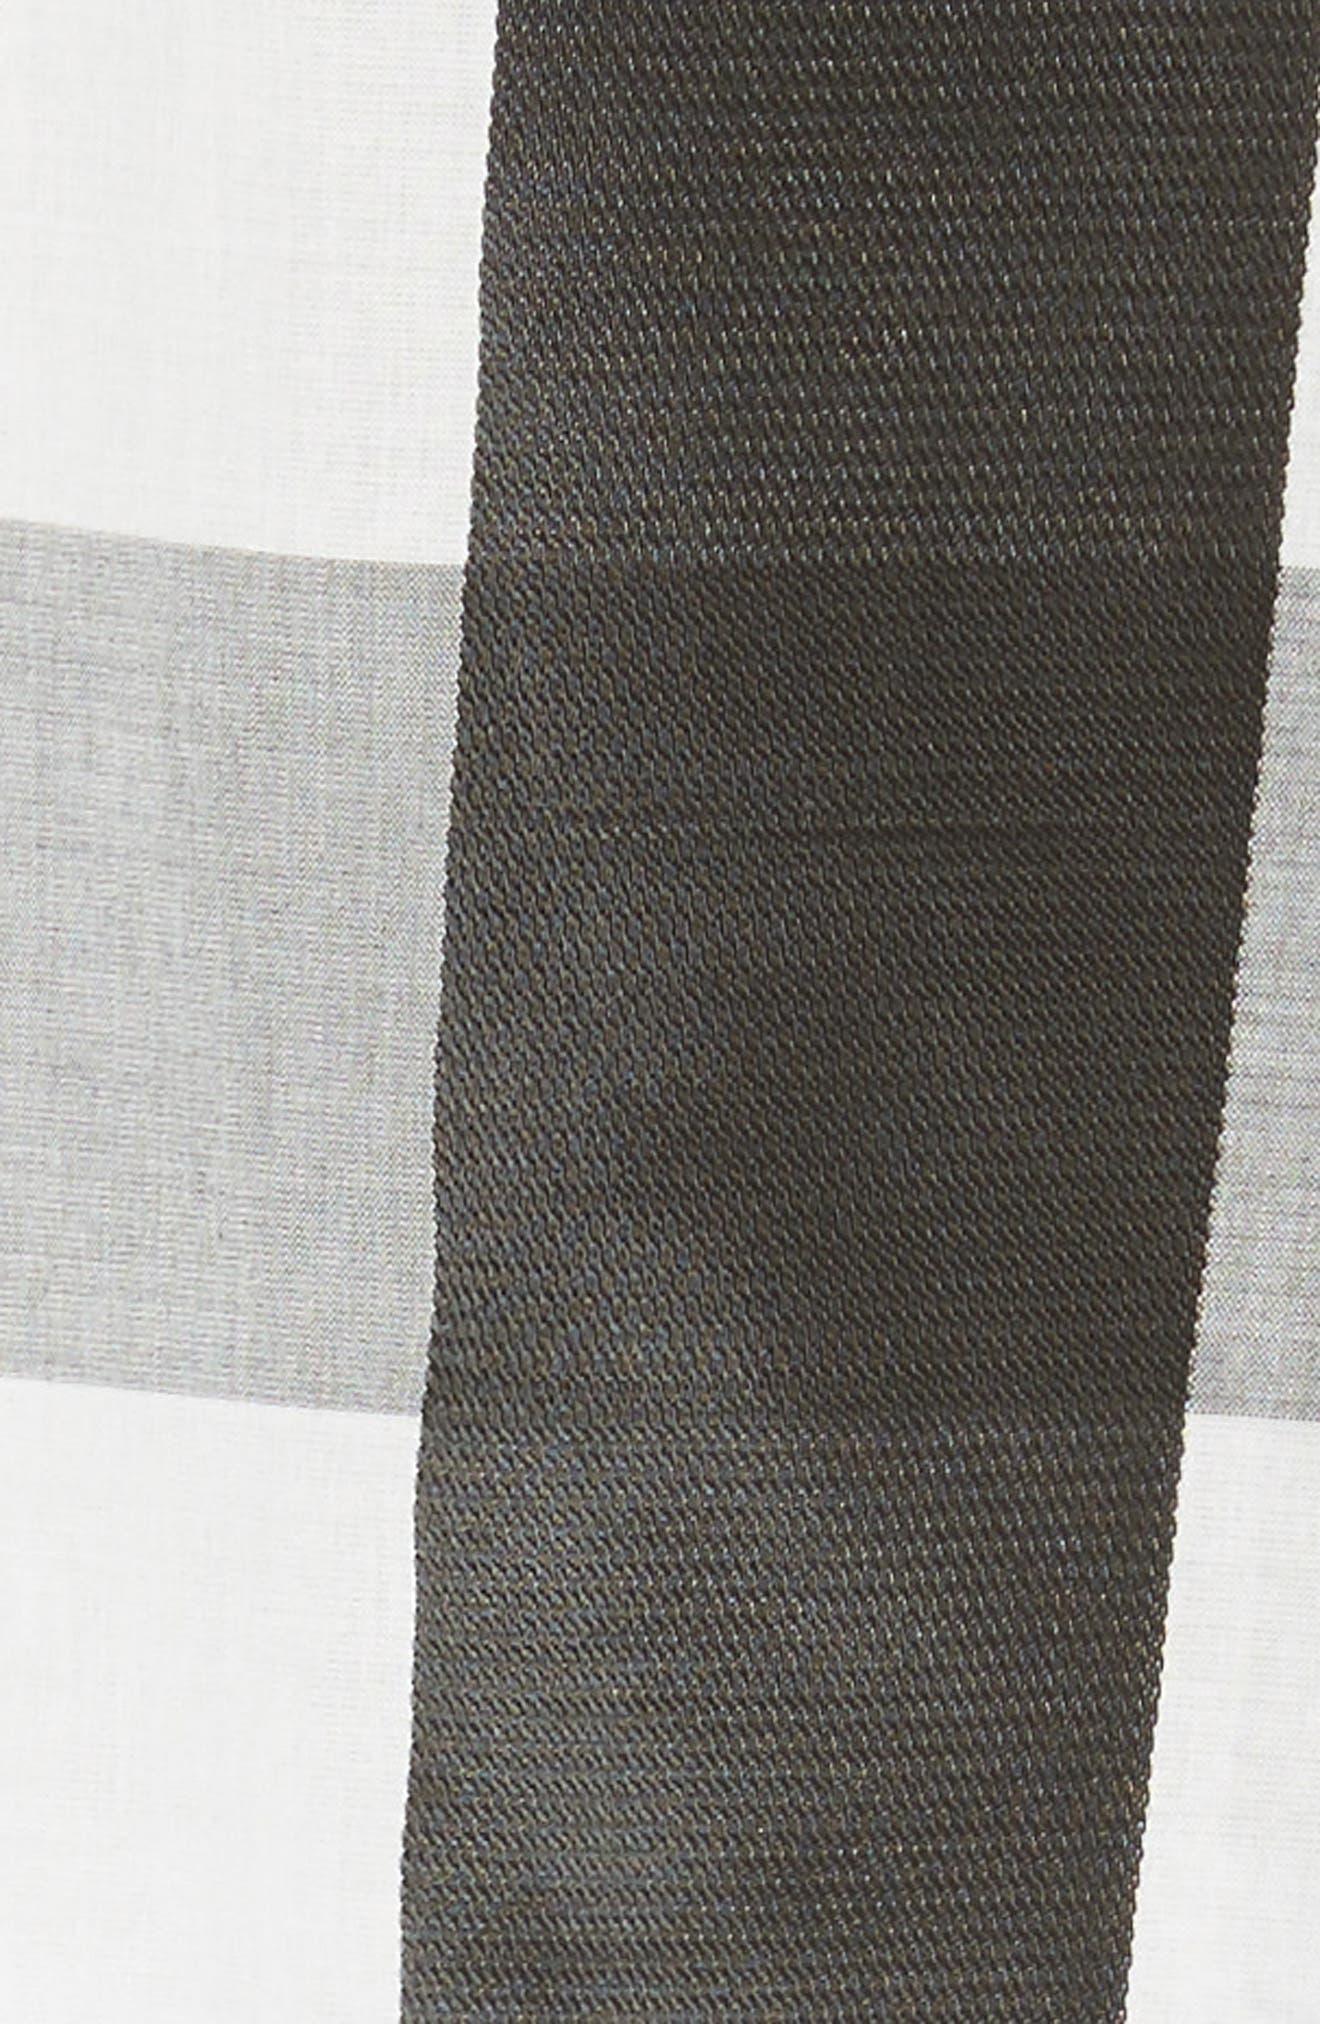 Posta Ruffle Tank,                             Alternate thumbnail 6, color,                             Black/ White